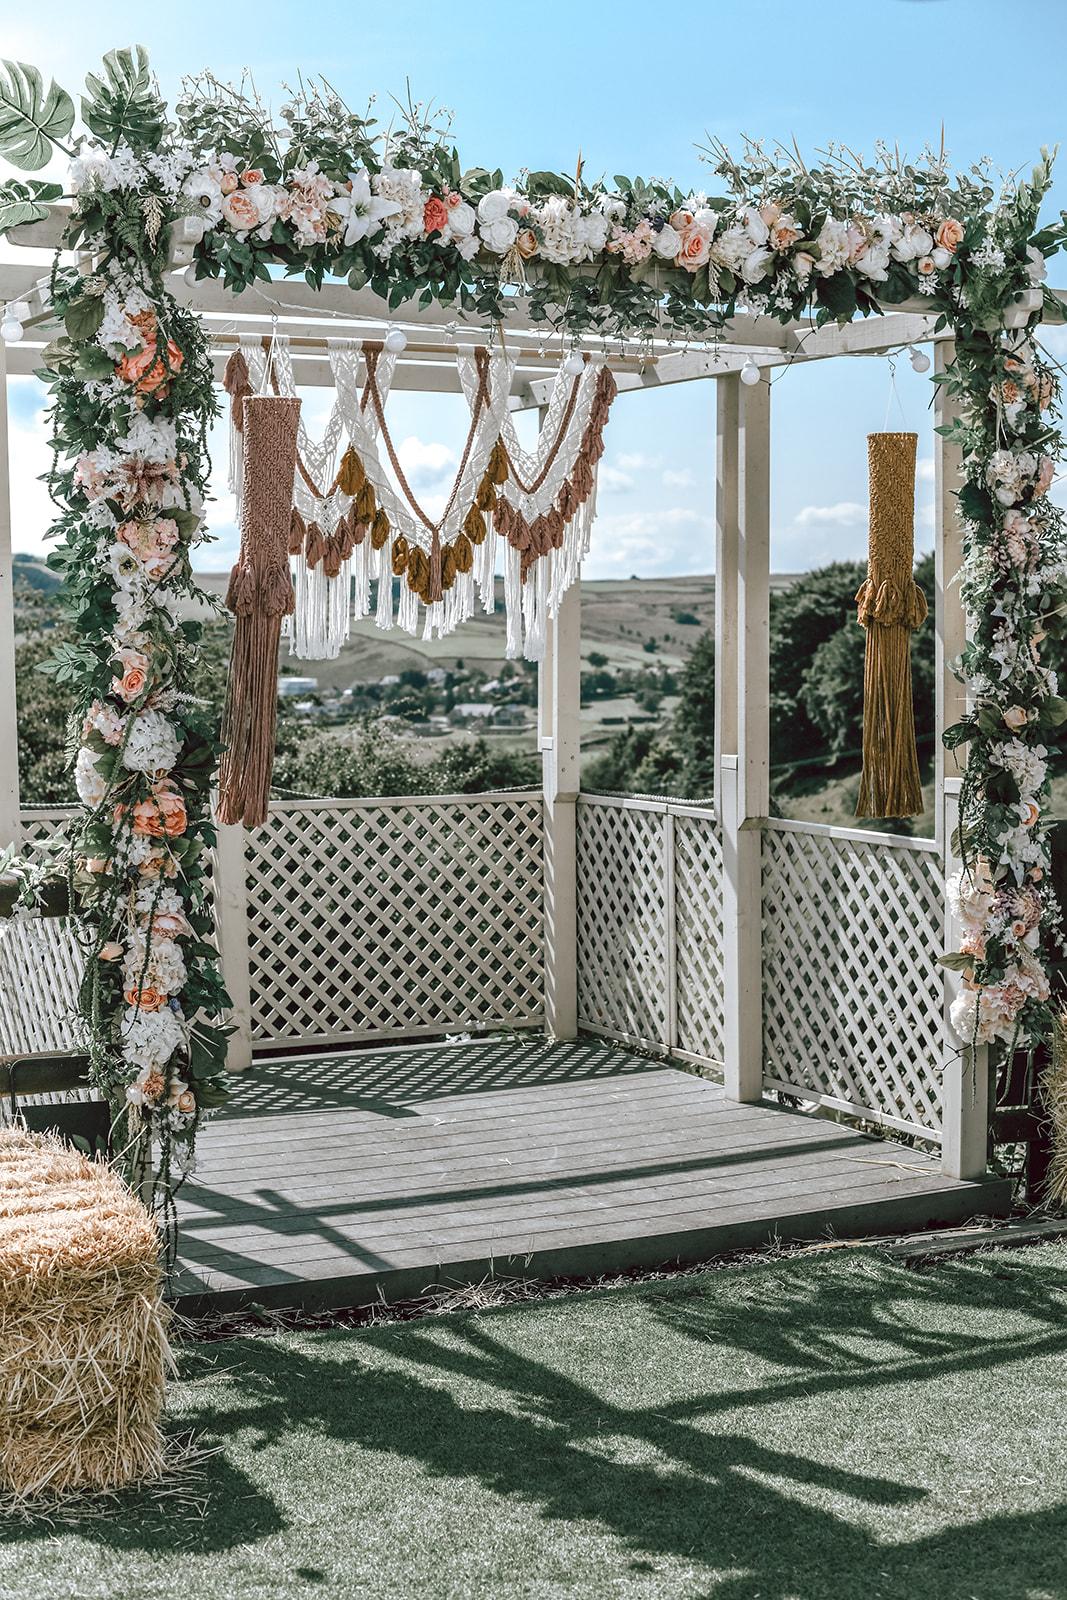 rustic festival wedding - outdoor wedding ceremony - macrame wedding decor - boho wedding ceremony